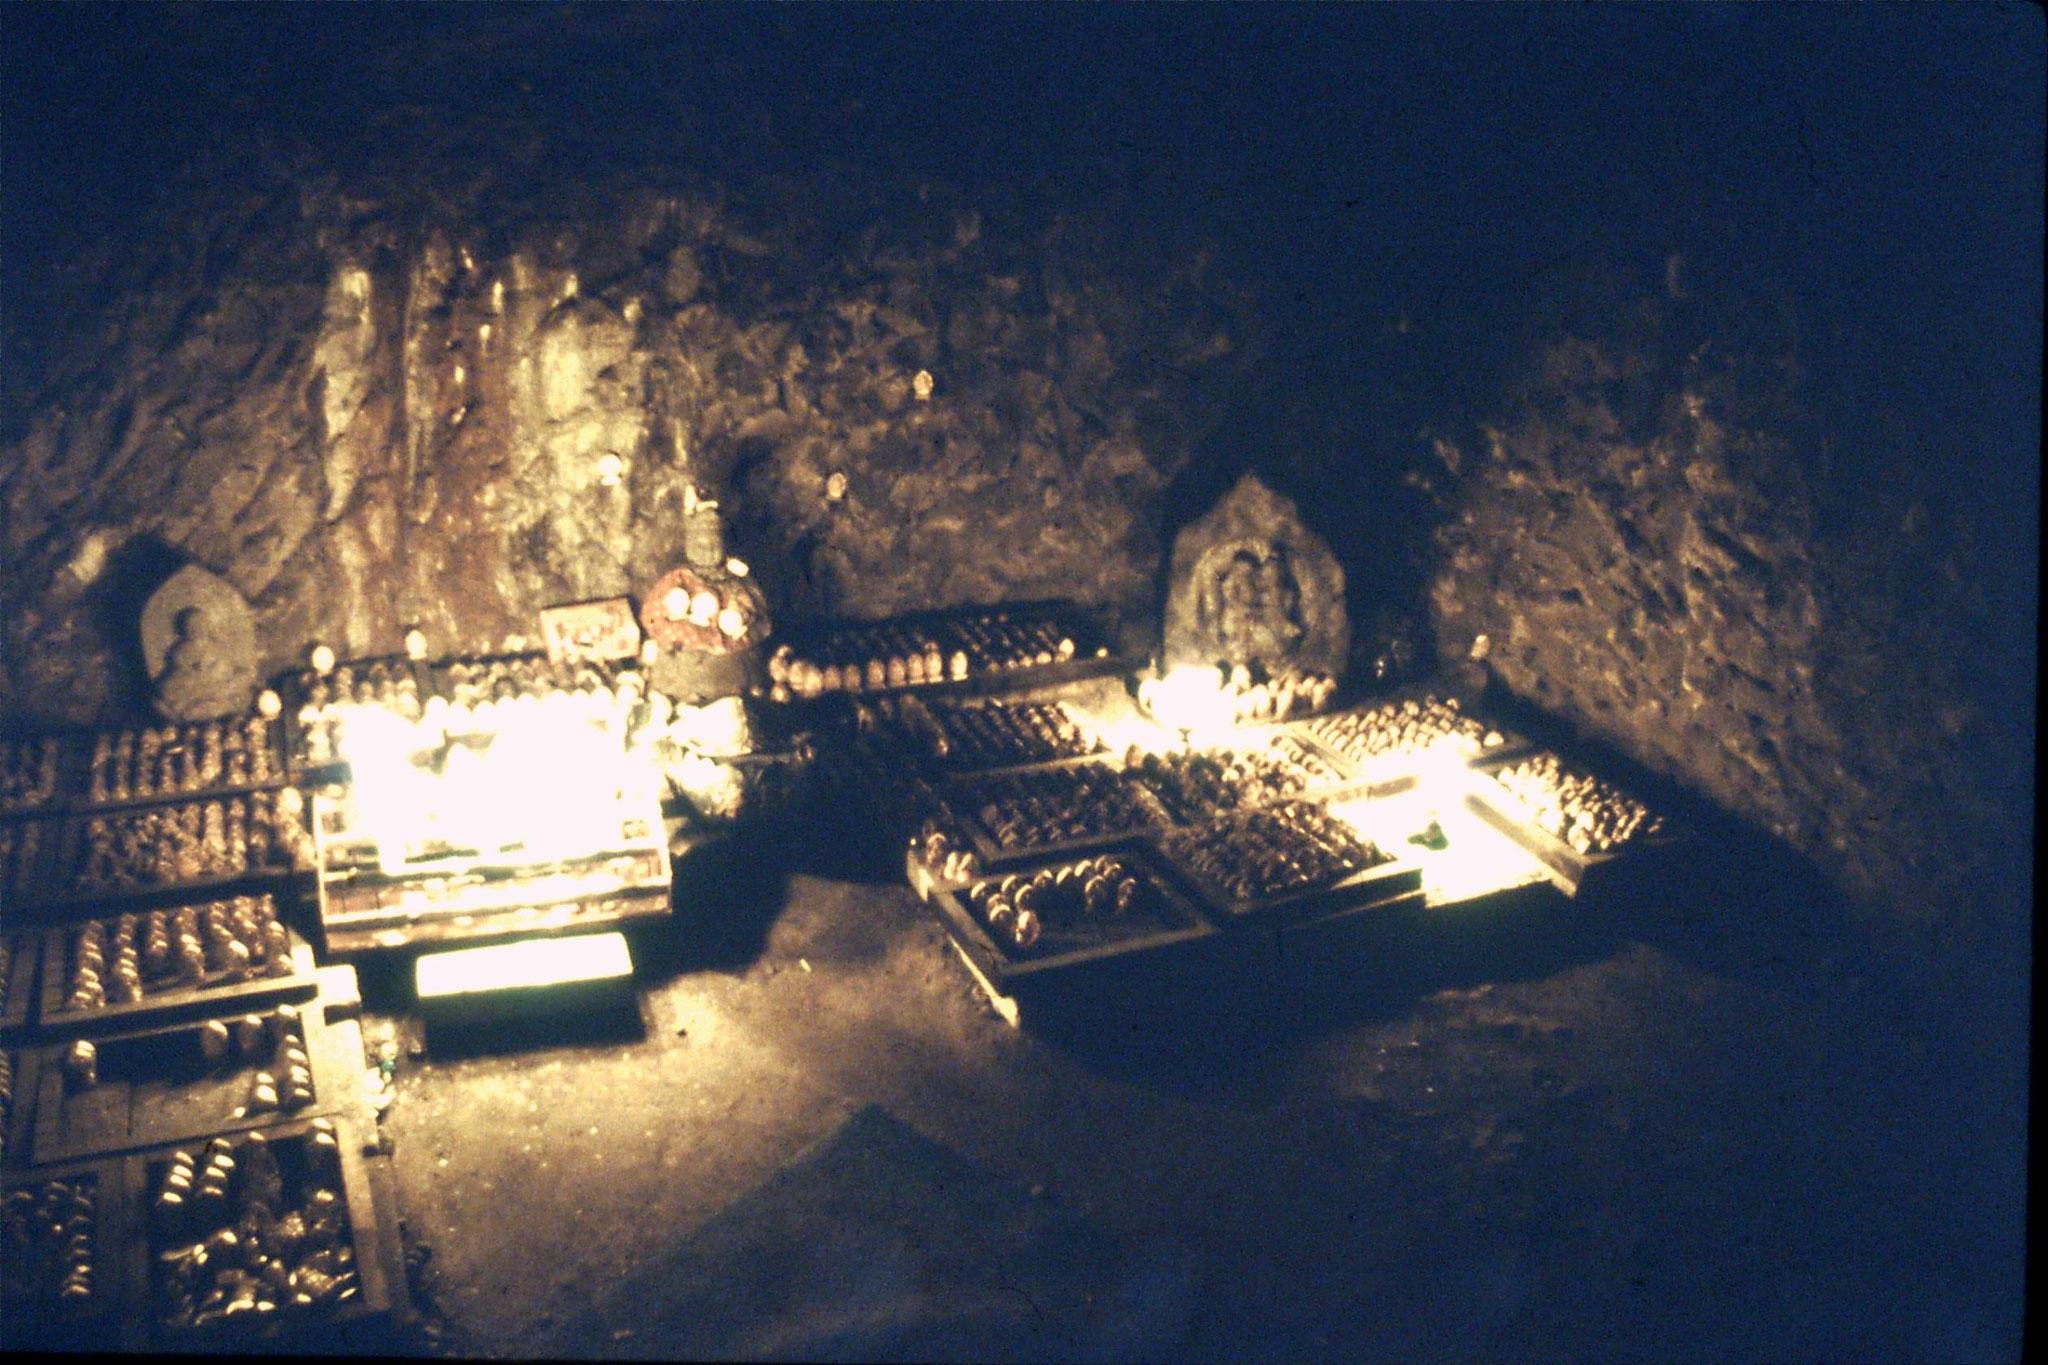 29/1/1989: 40: grotto